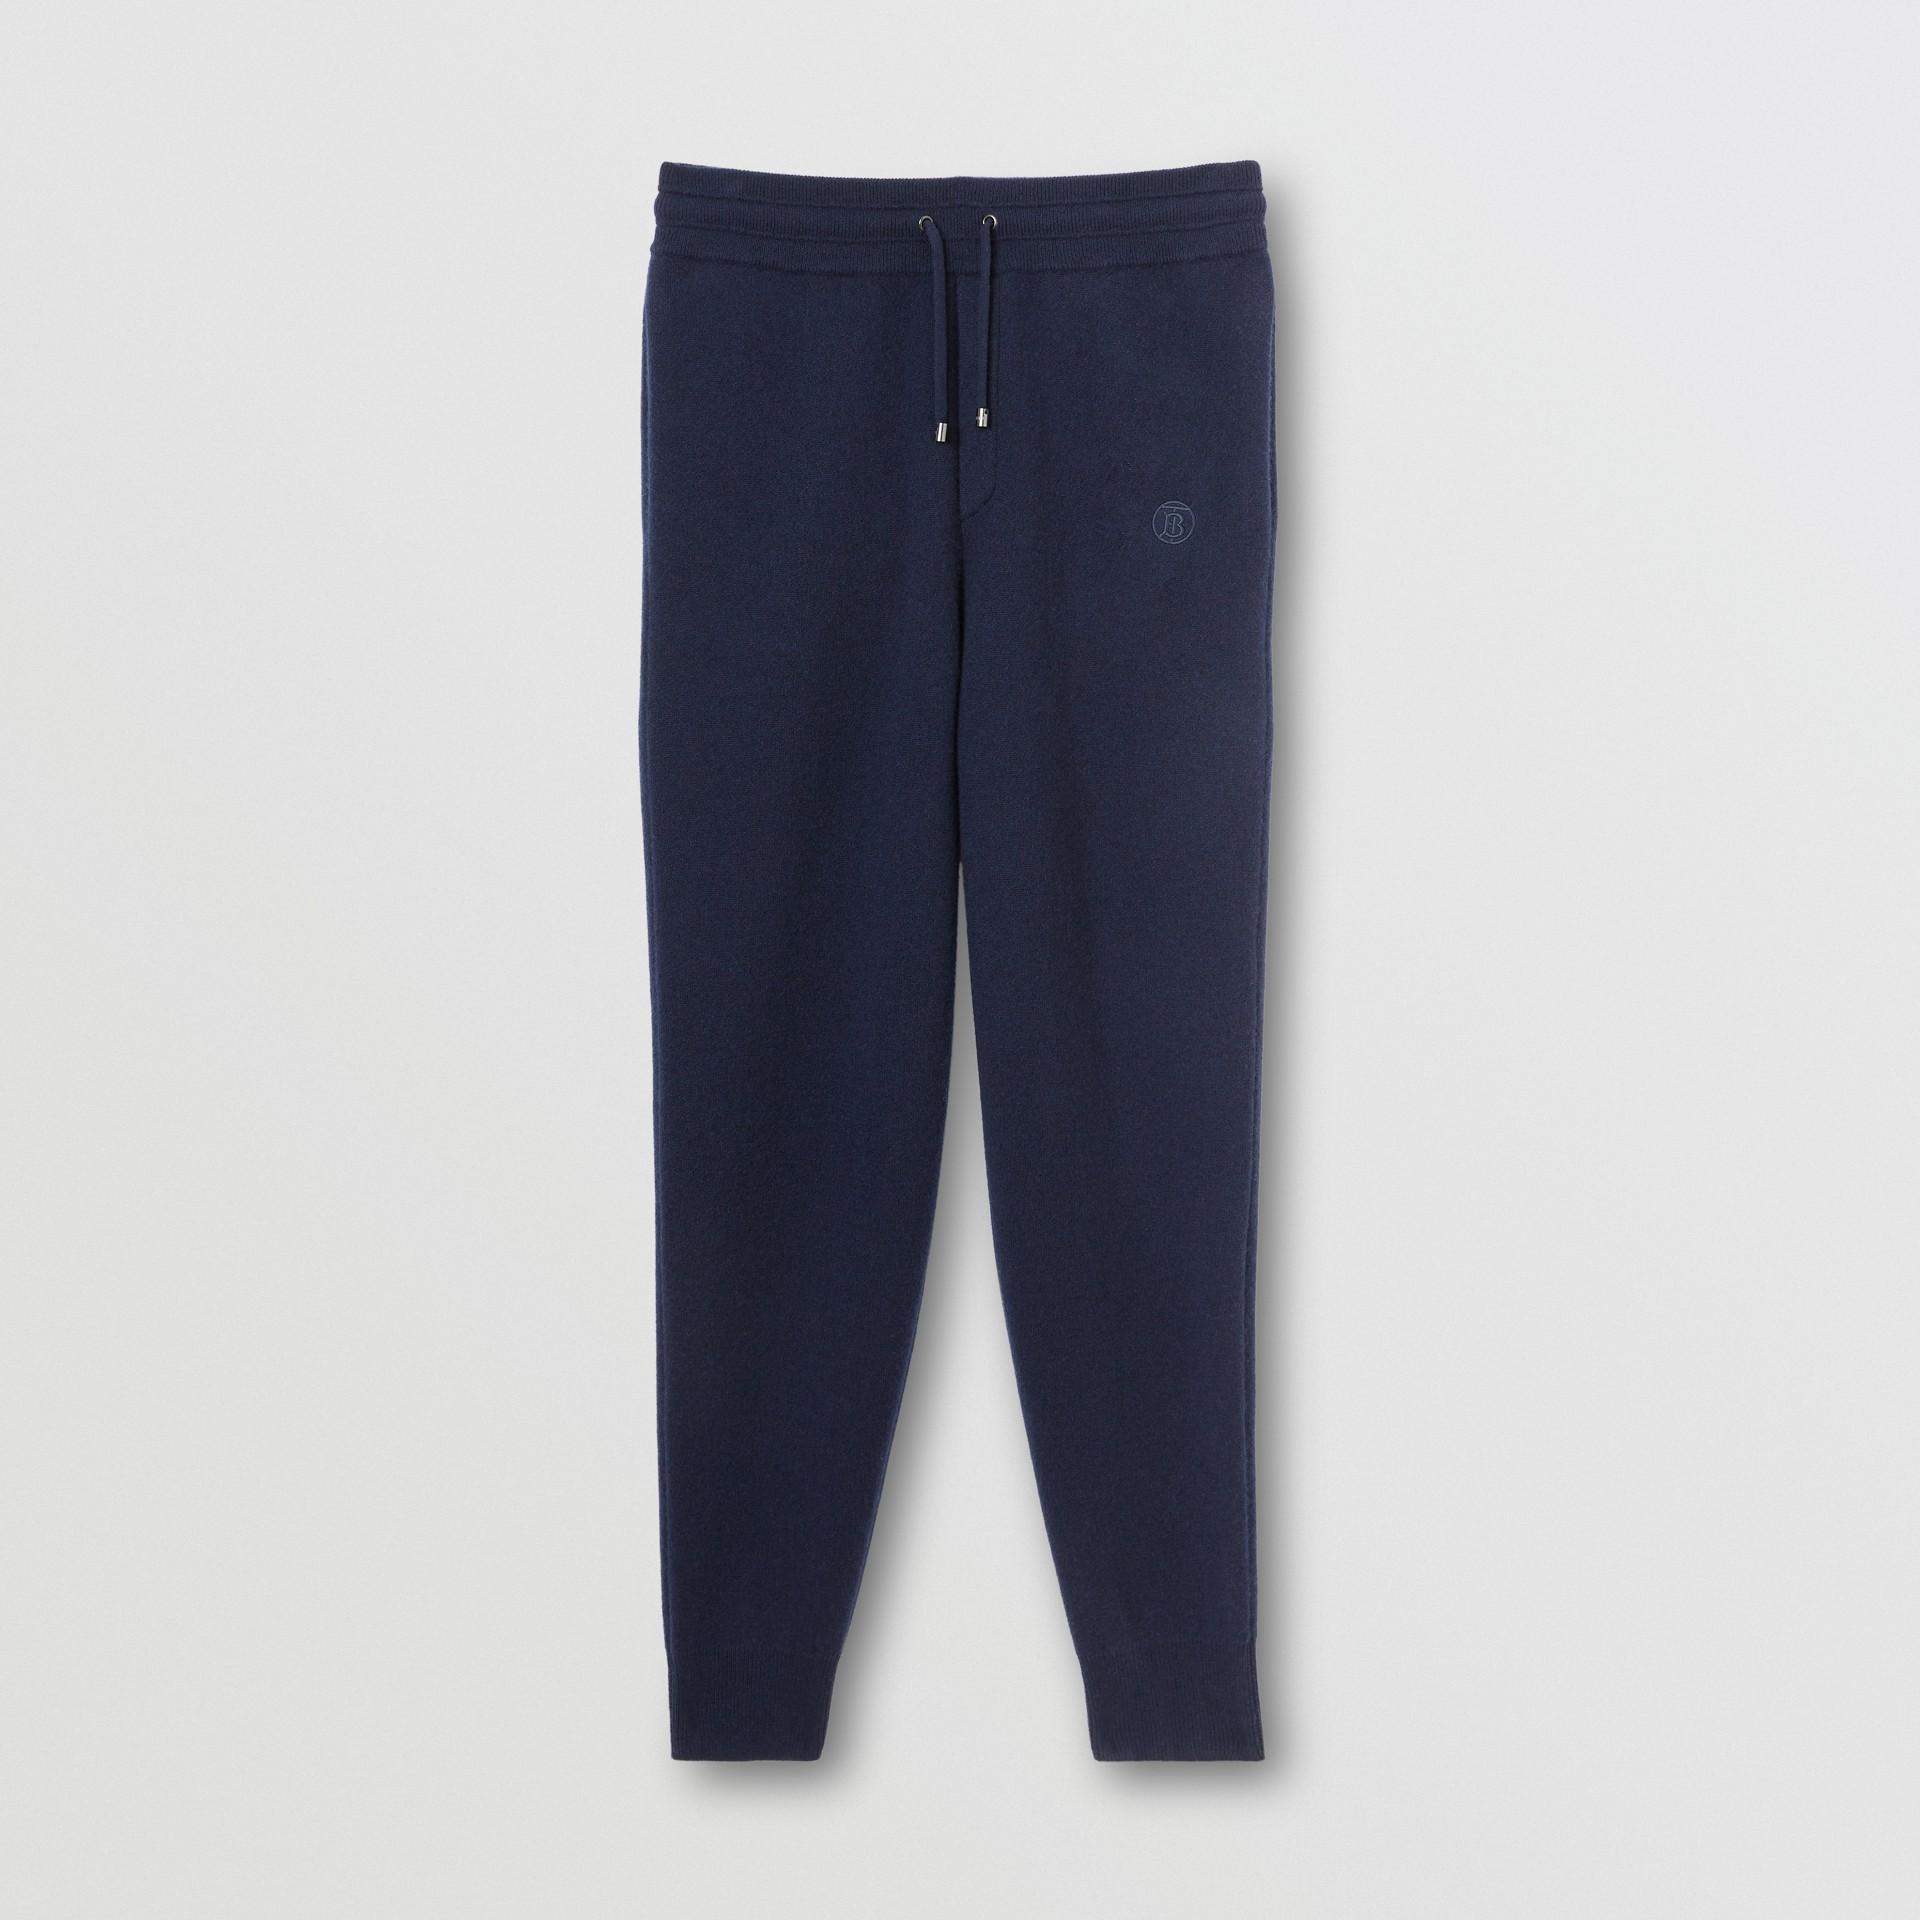 Monogram Motif Cashmere Blend Jogging Pants in Navy - Men   Burberry - gallery image 3